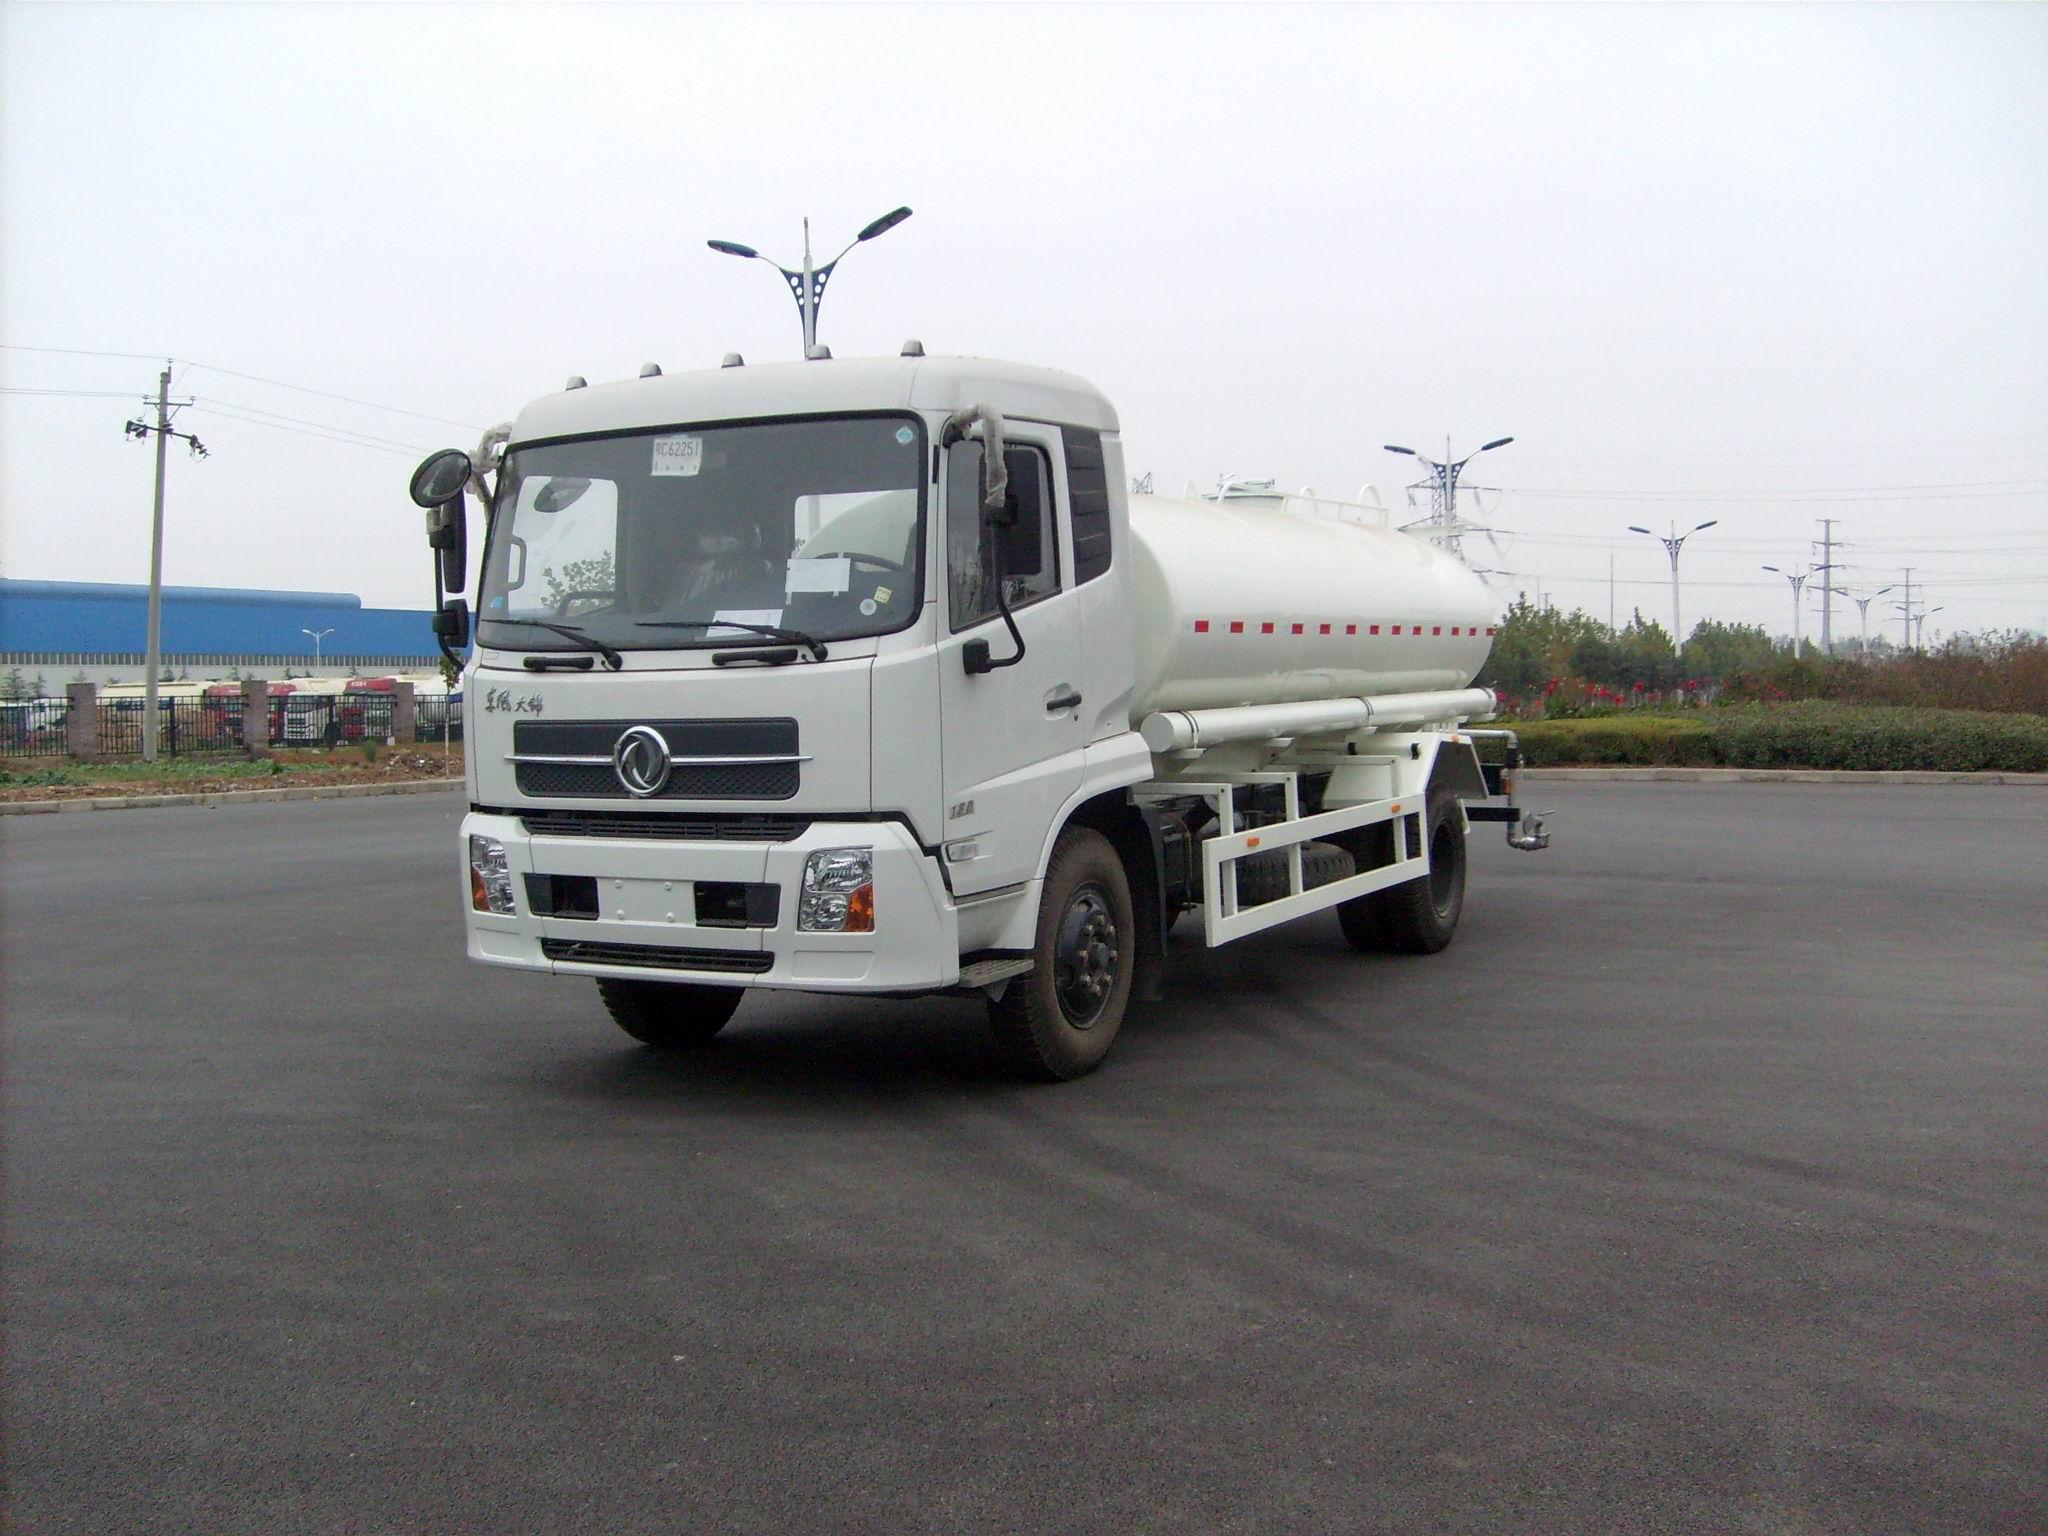 CIMC LINYU 7-15m3 water truck